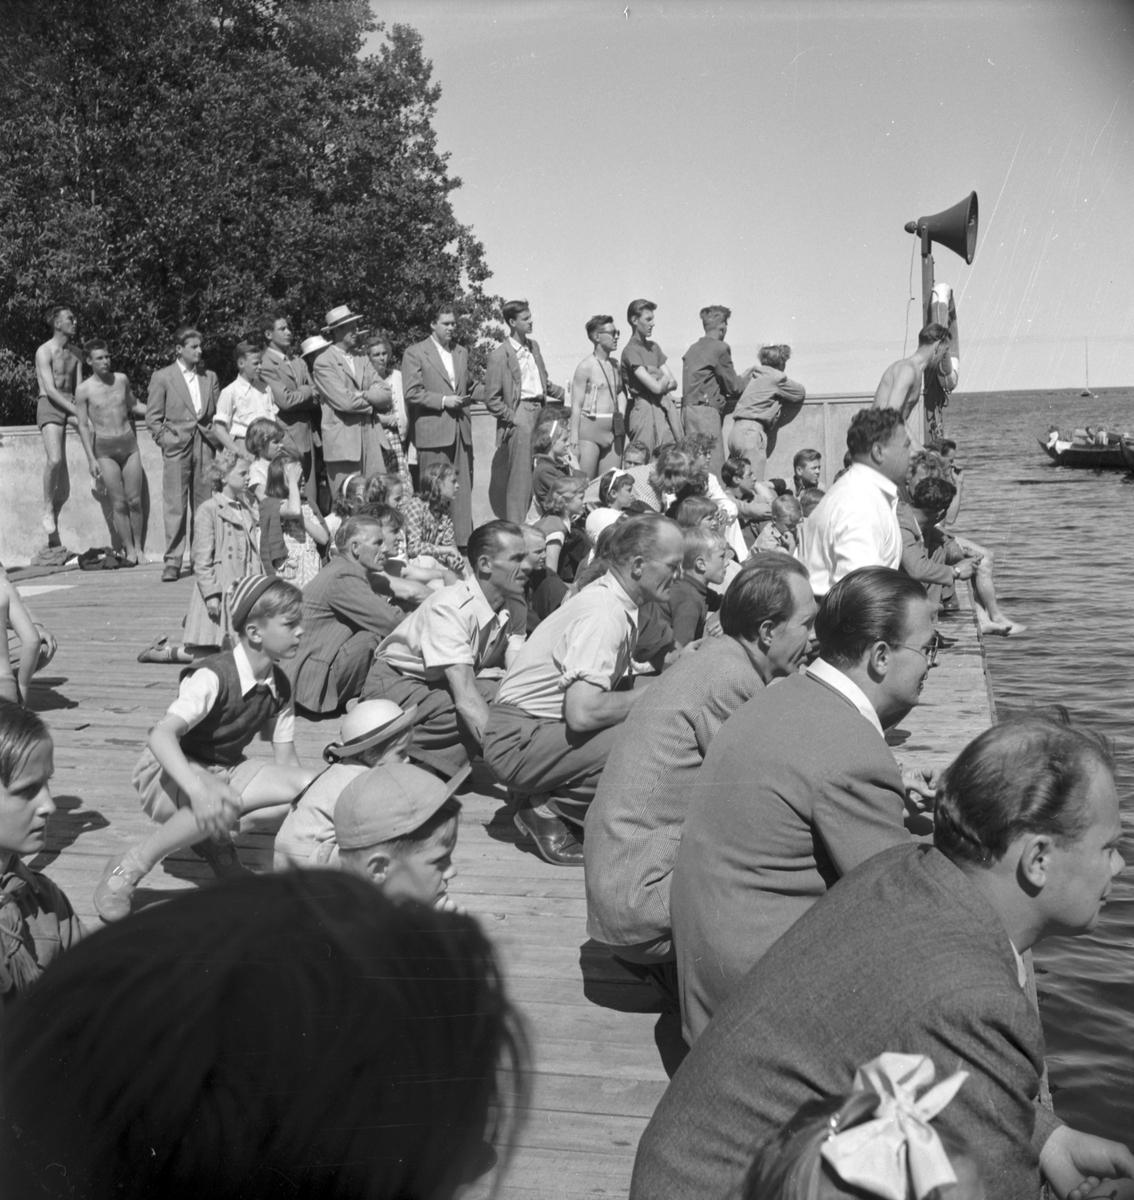 Simningens dag firas i Furuvik. 6 juli 1952.           Beställn. Margit Öberg, Väpnargatan 8 A, Gävle